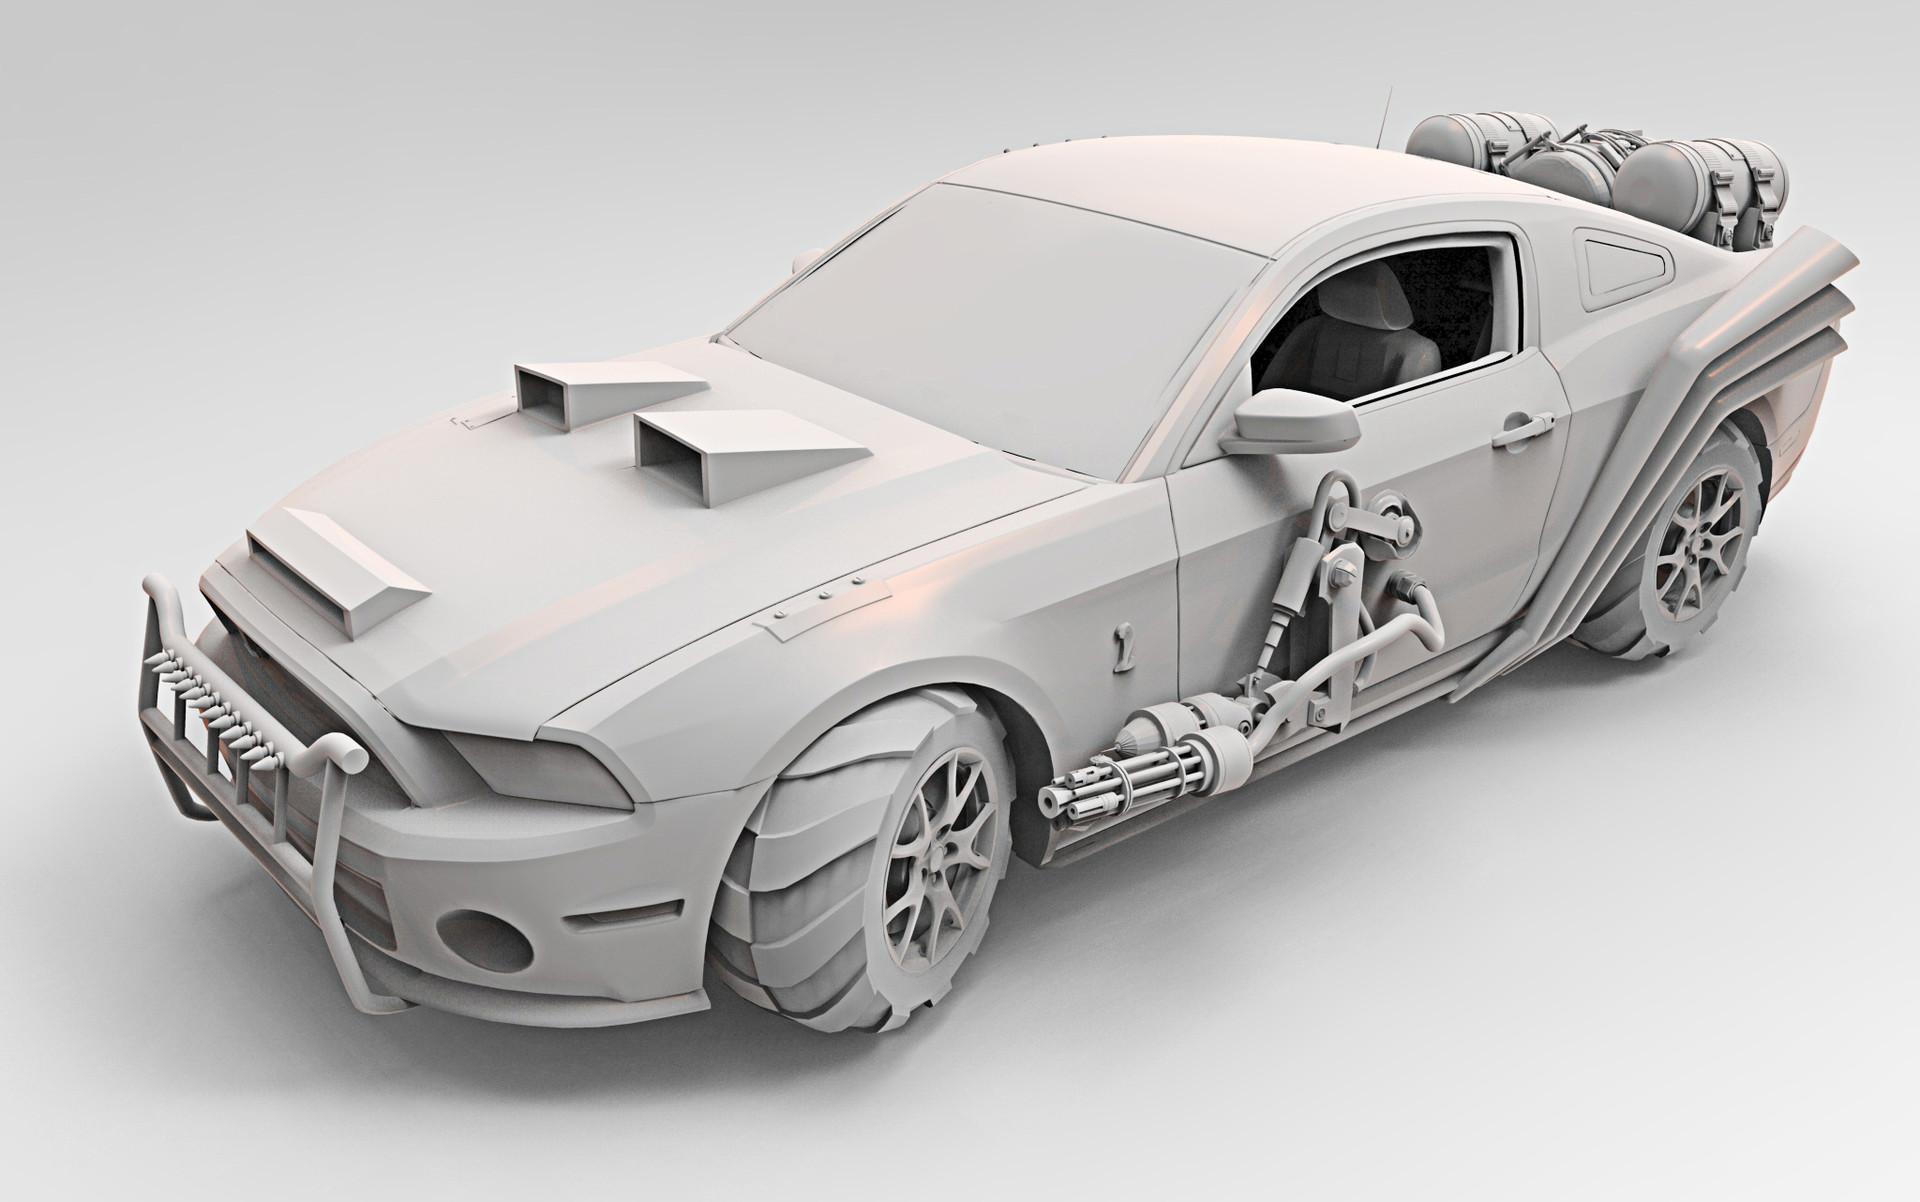 Virendra Shekhawat Vj Mustang Concept Car Madmax Fan Art